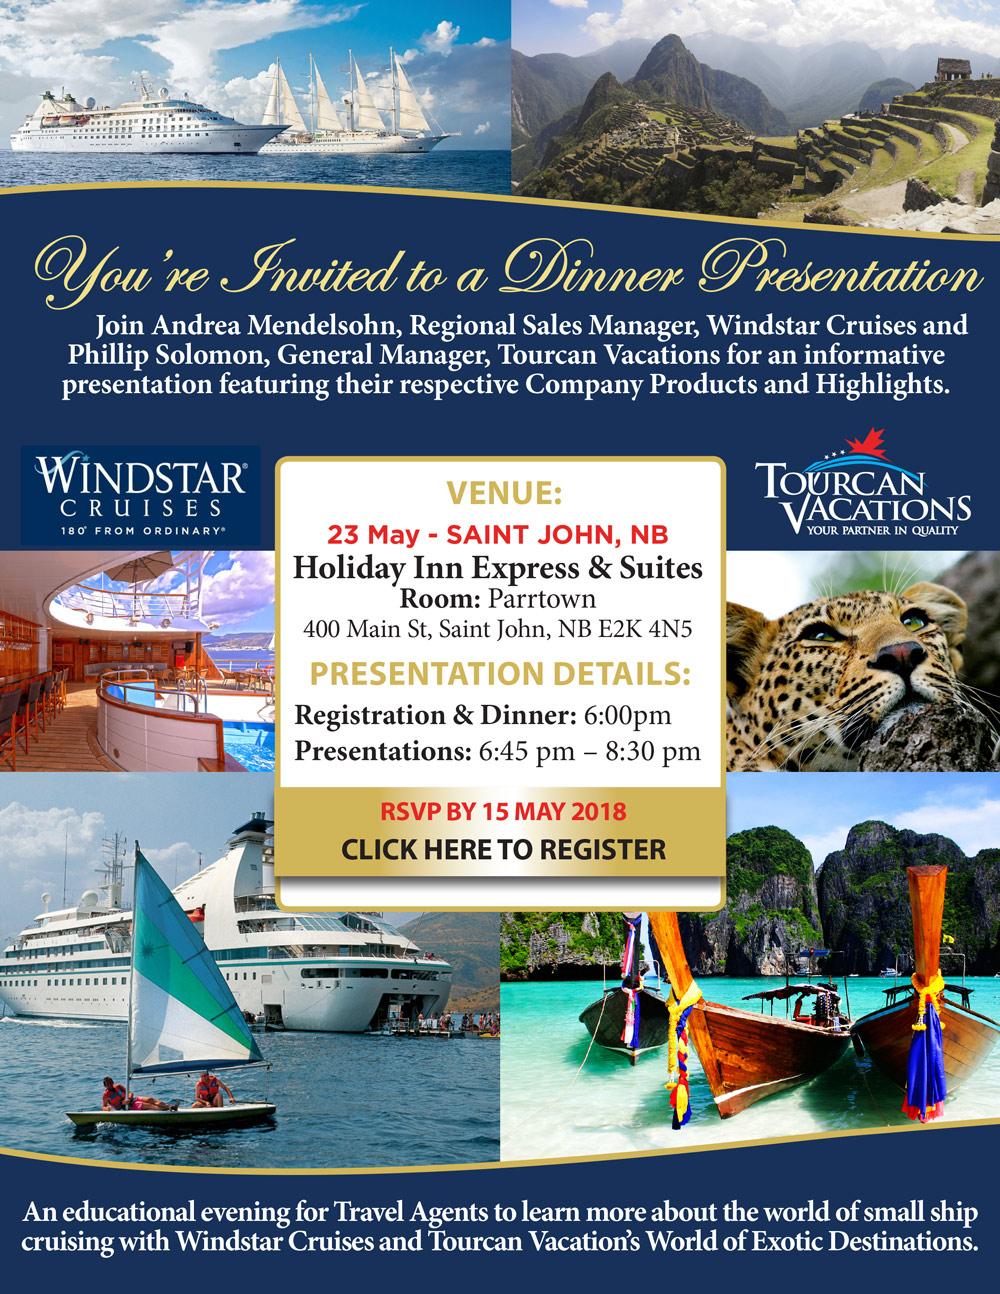 tourcan-2018-presentations-dinner-invite-tourcan-vacations-and-windstar-cruises-saint-john